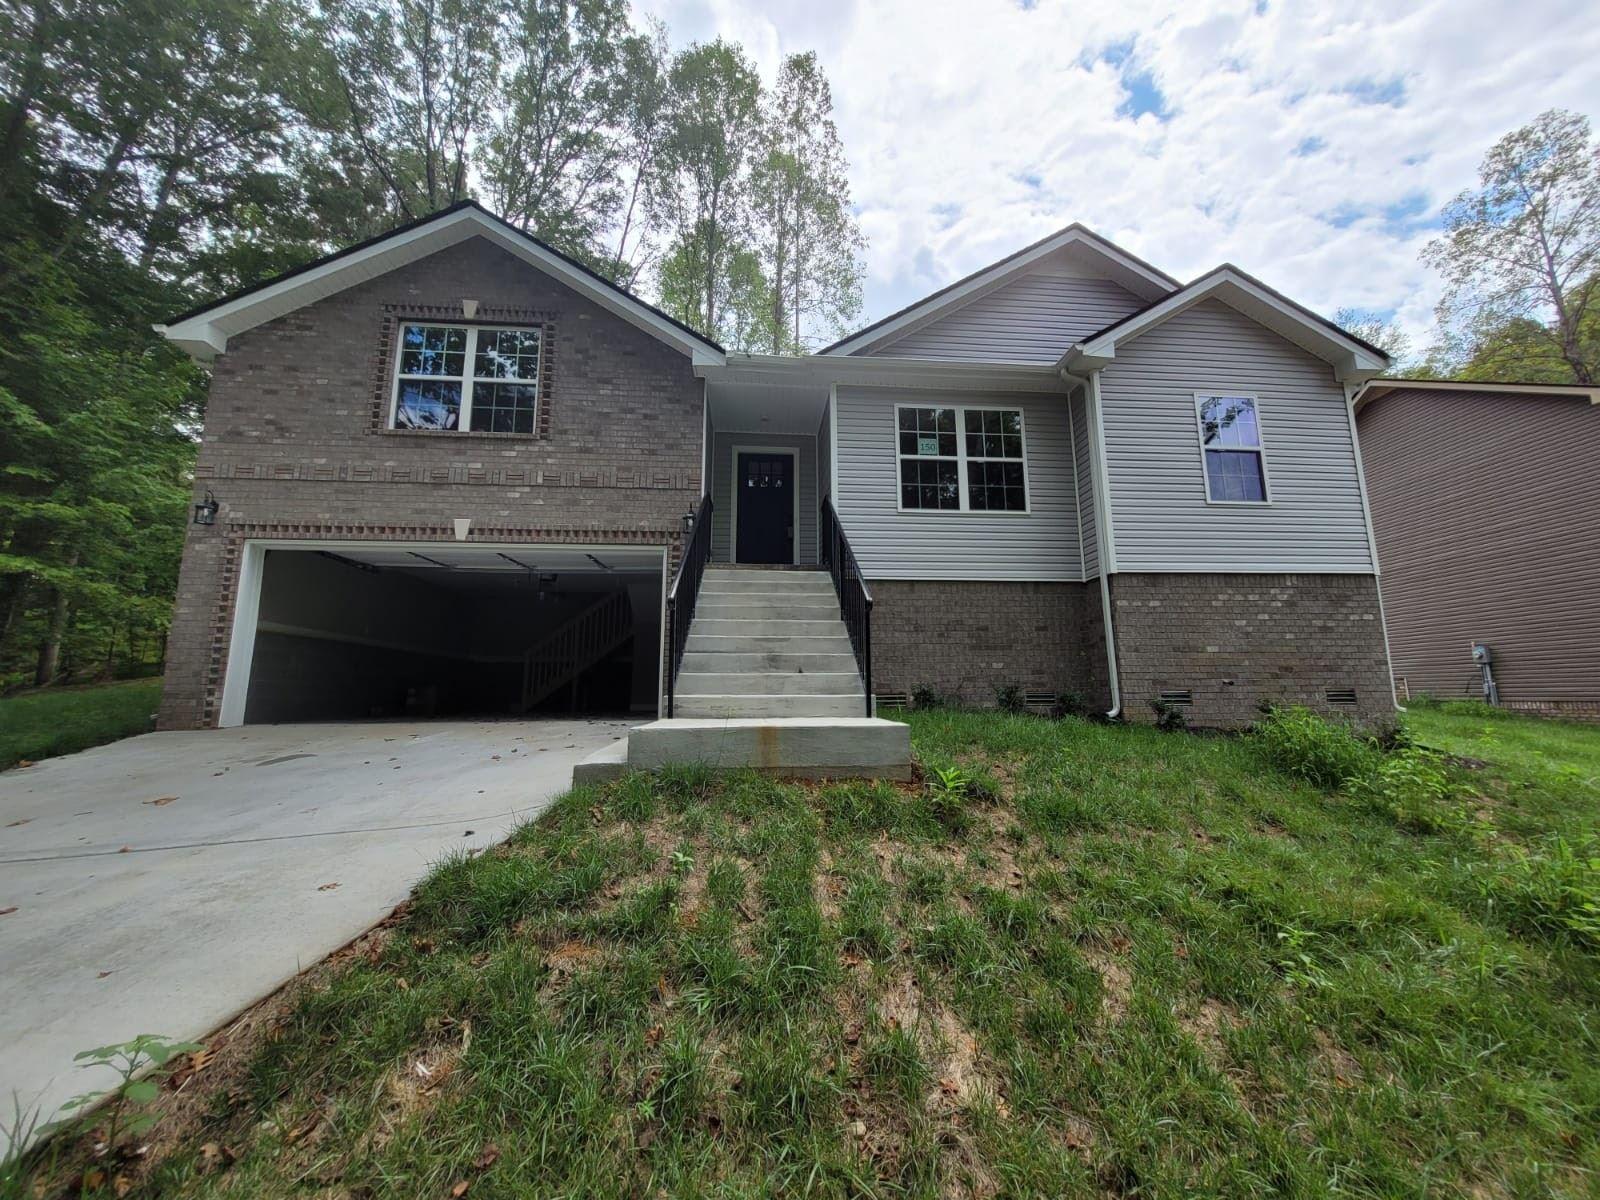 150 Glenstone, Clarksville, TN 37043 - MLS#: 2224267